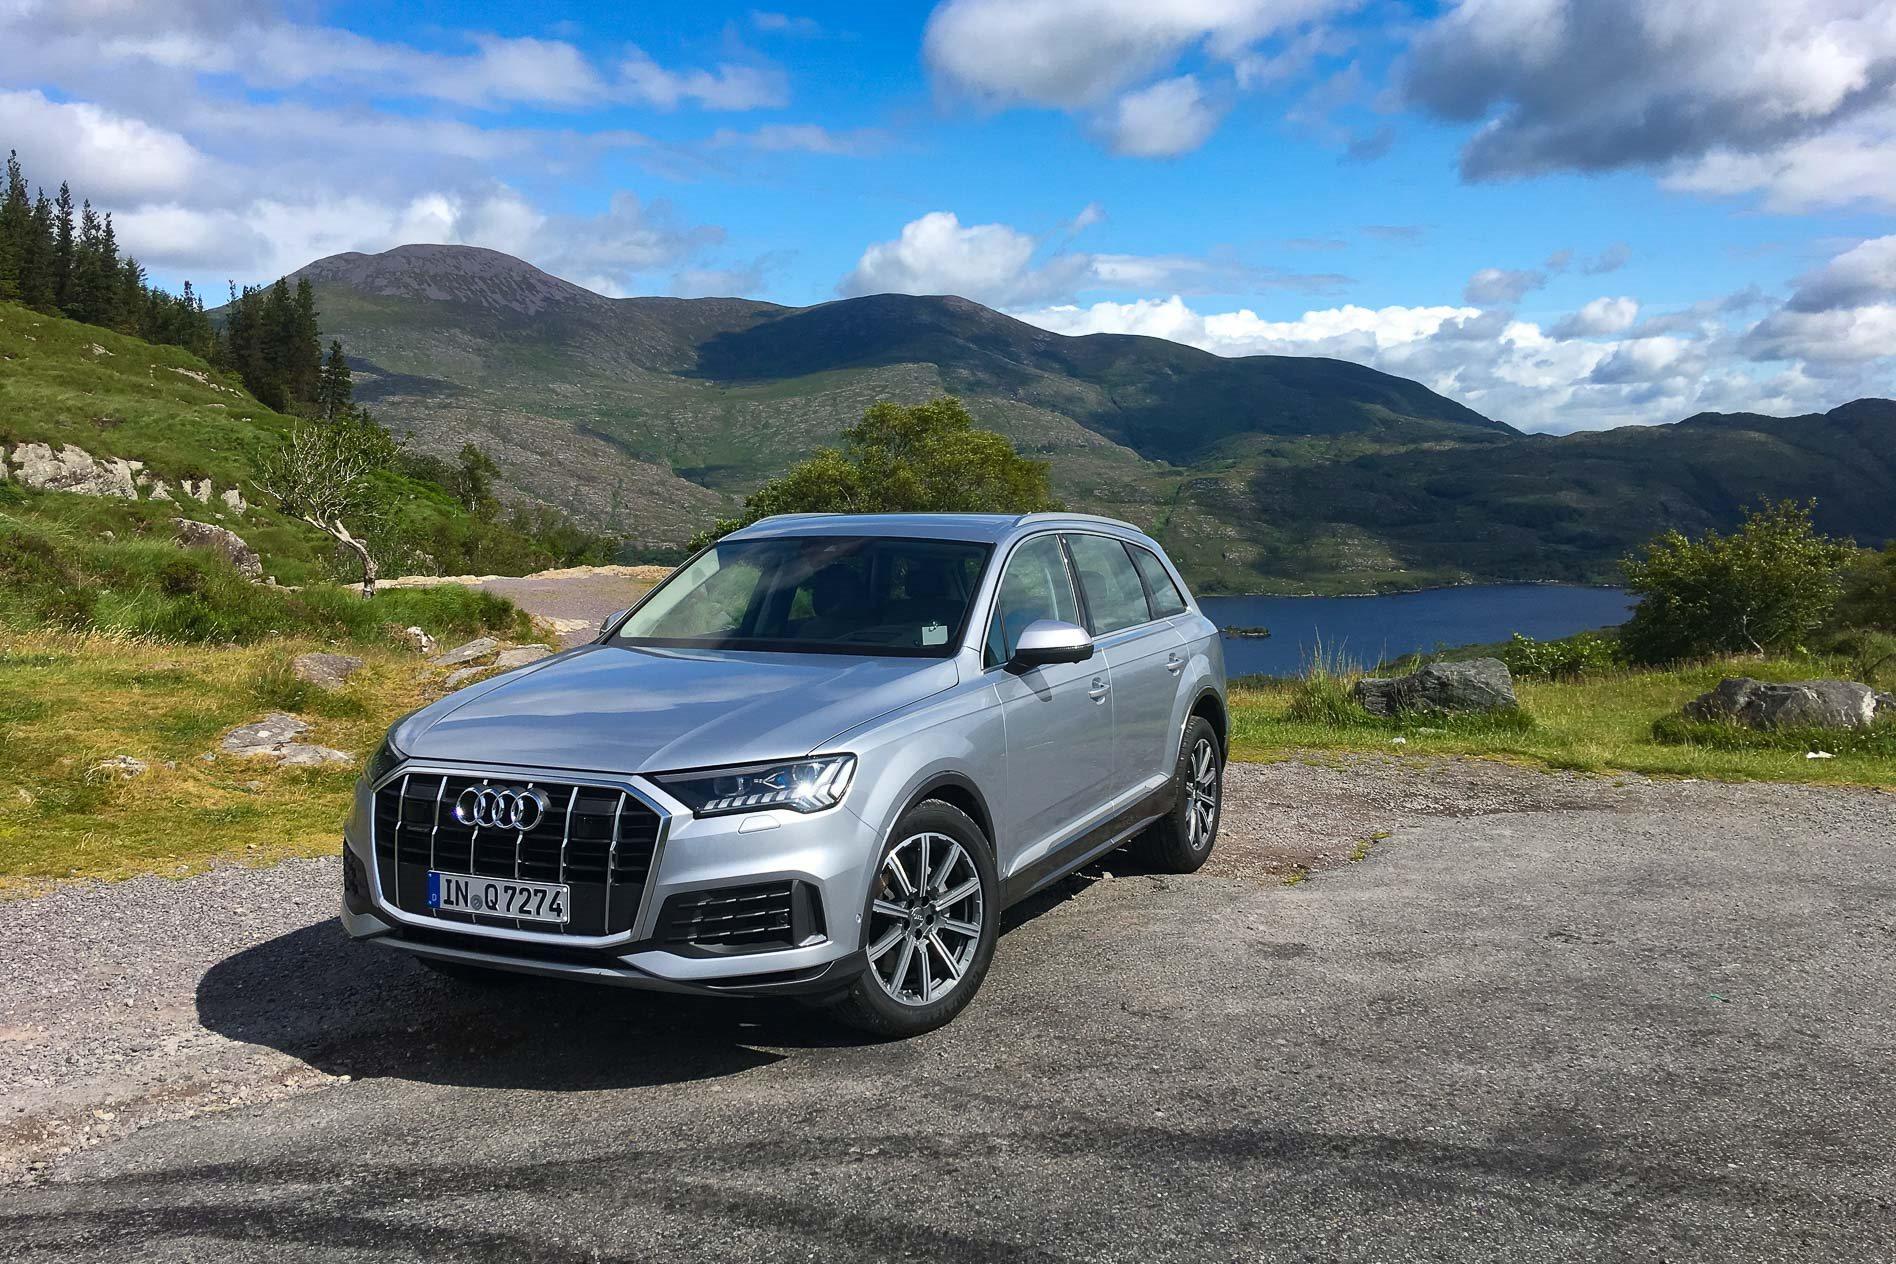 2020 Audi Q7 Review.2020 Audi Q7 Review